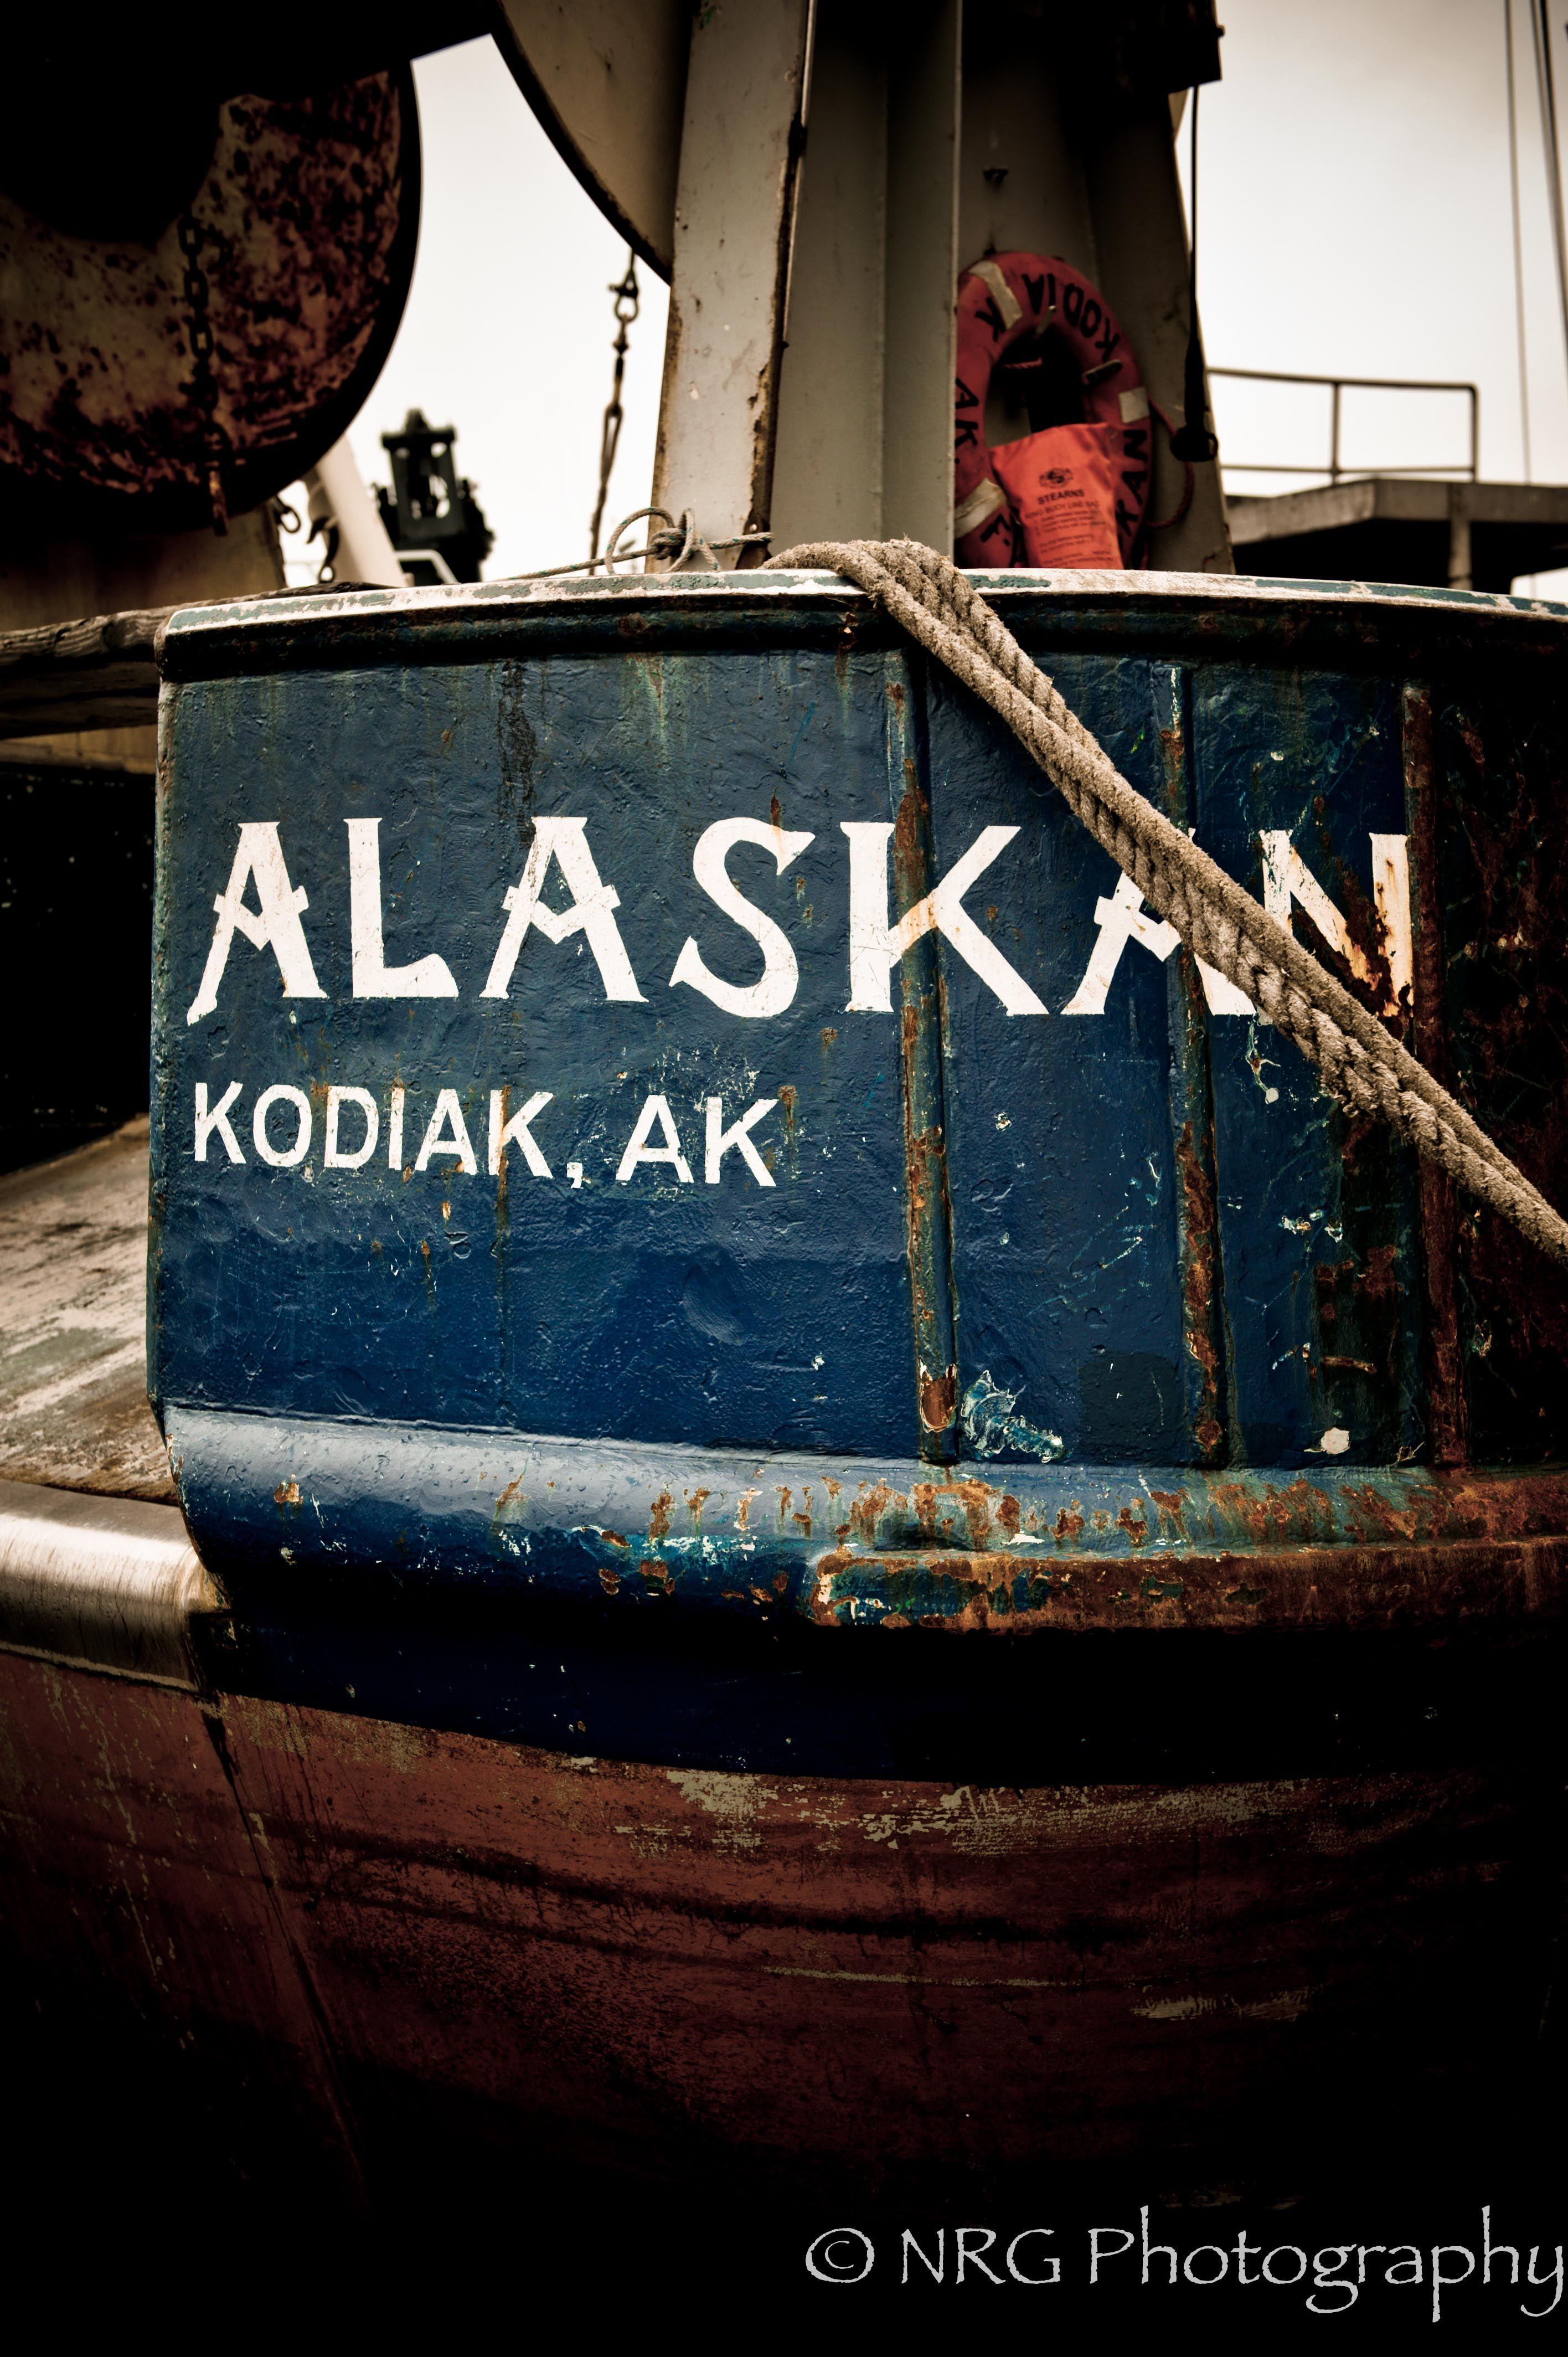 Alaskan Stern Kodiak Island Alaska Http Vacationtravelogue